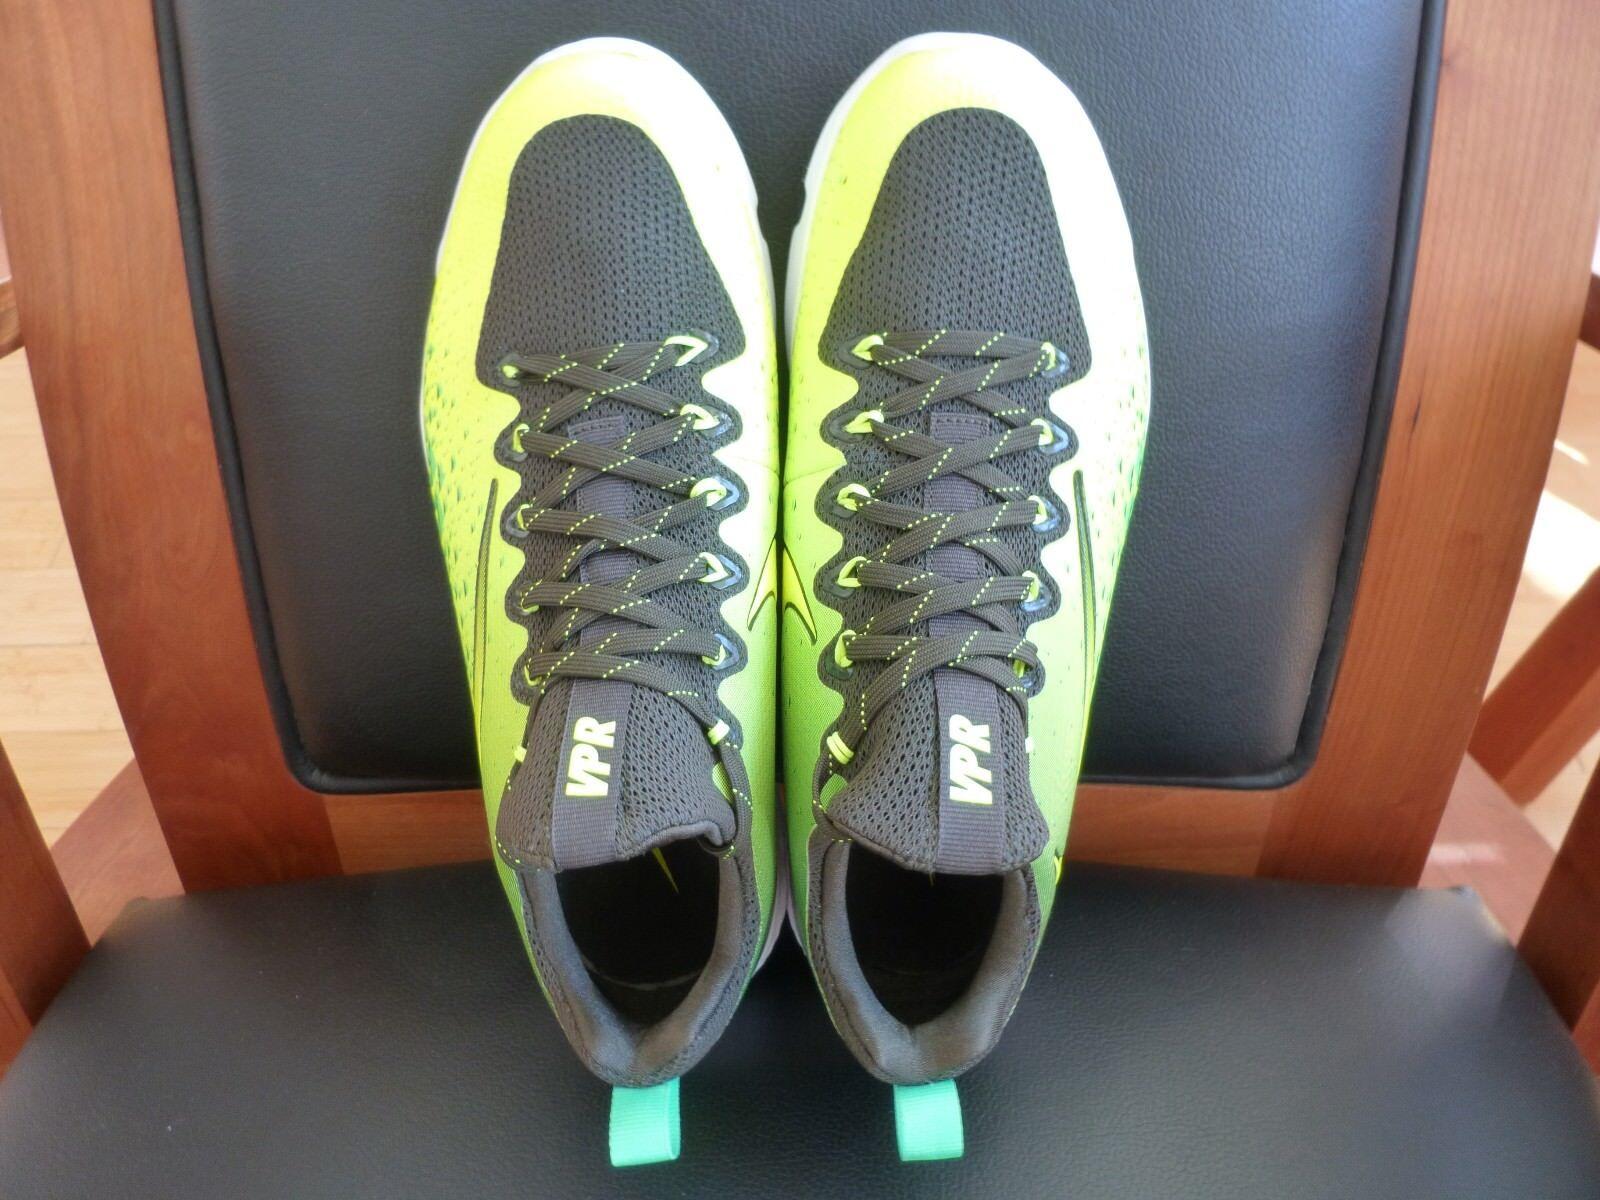 Men's Nike Vapor Speed Turf Football Trainers Shoes 833408 Volt 10.5